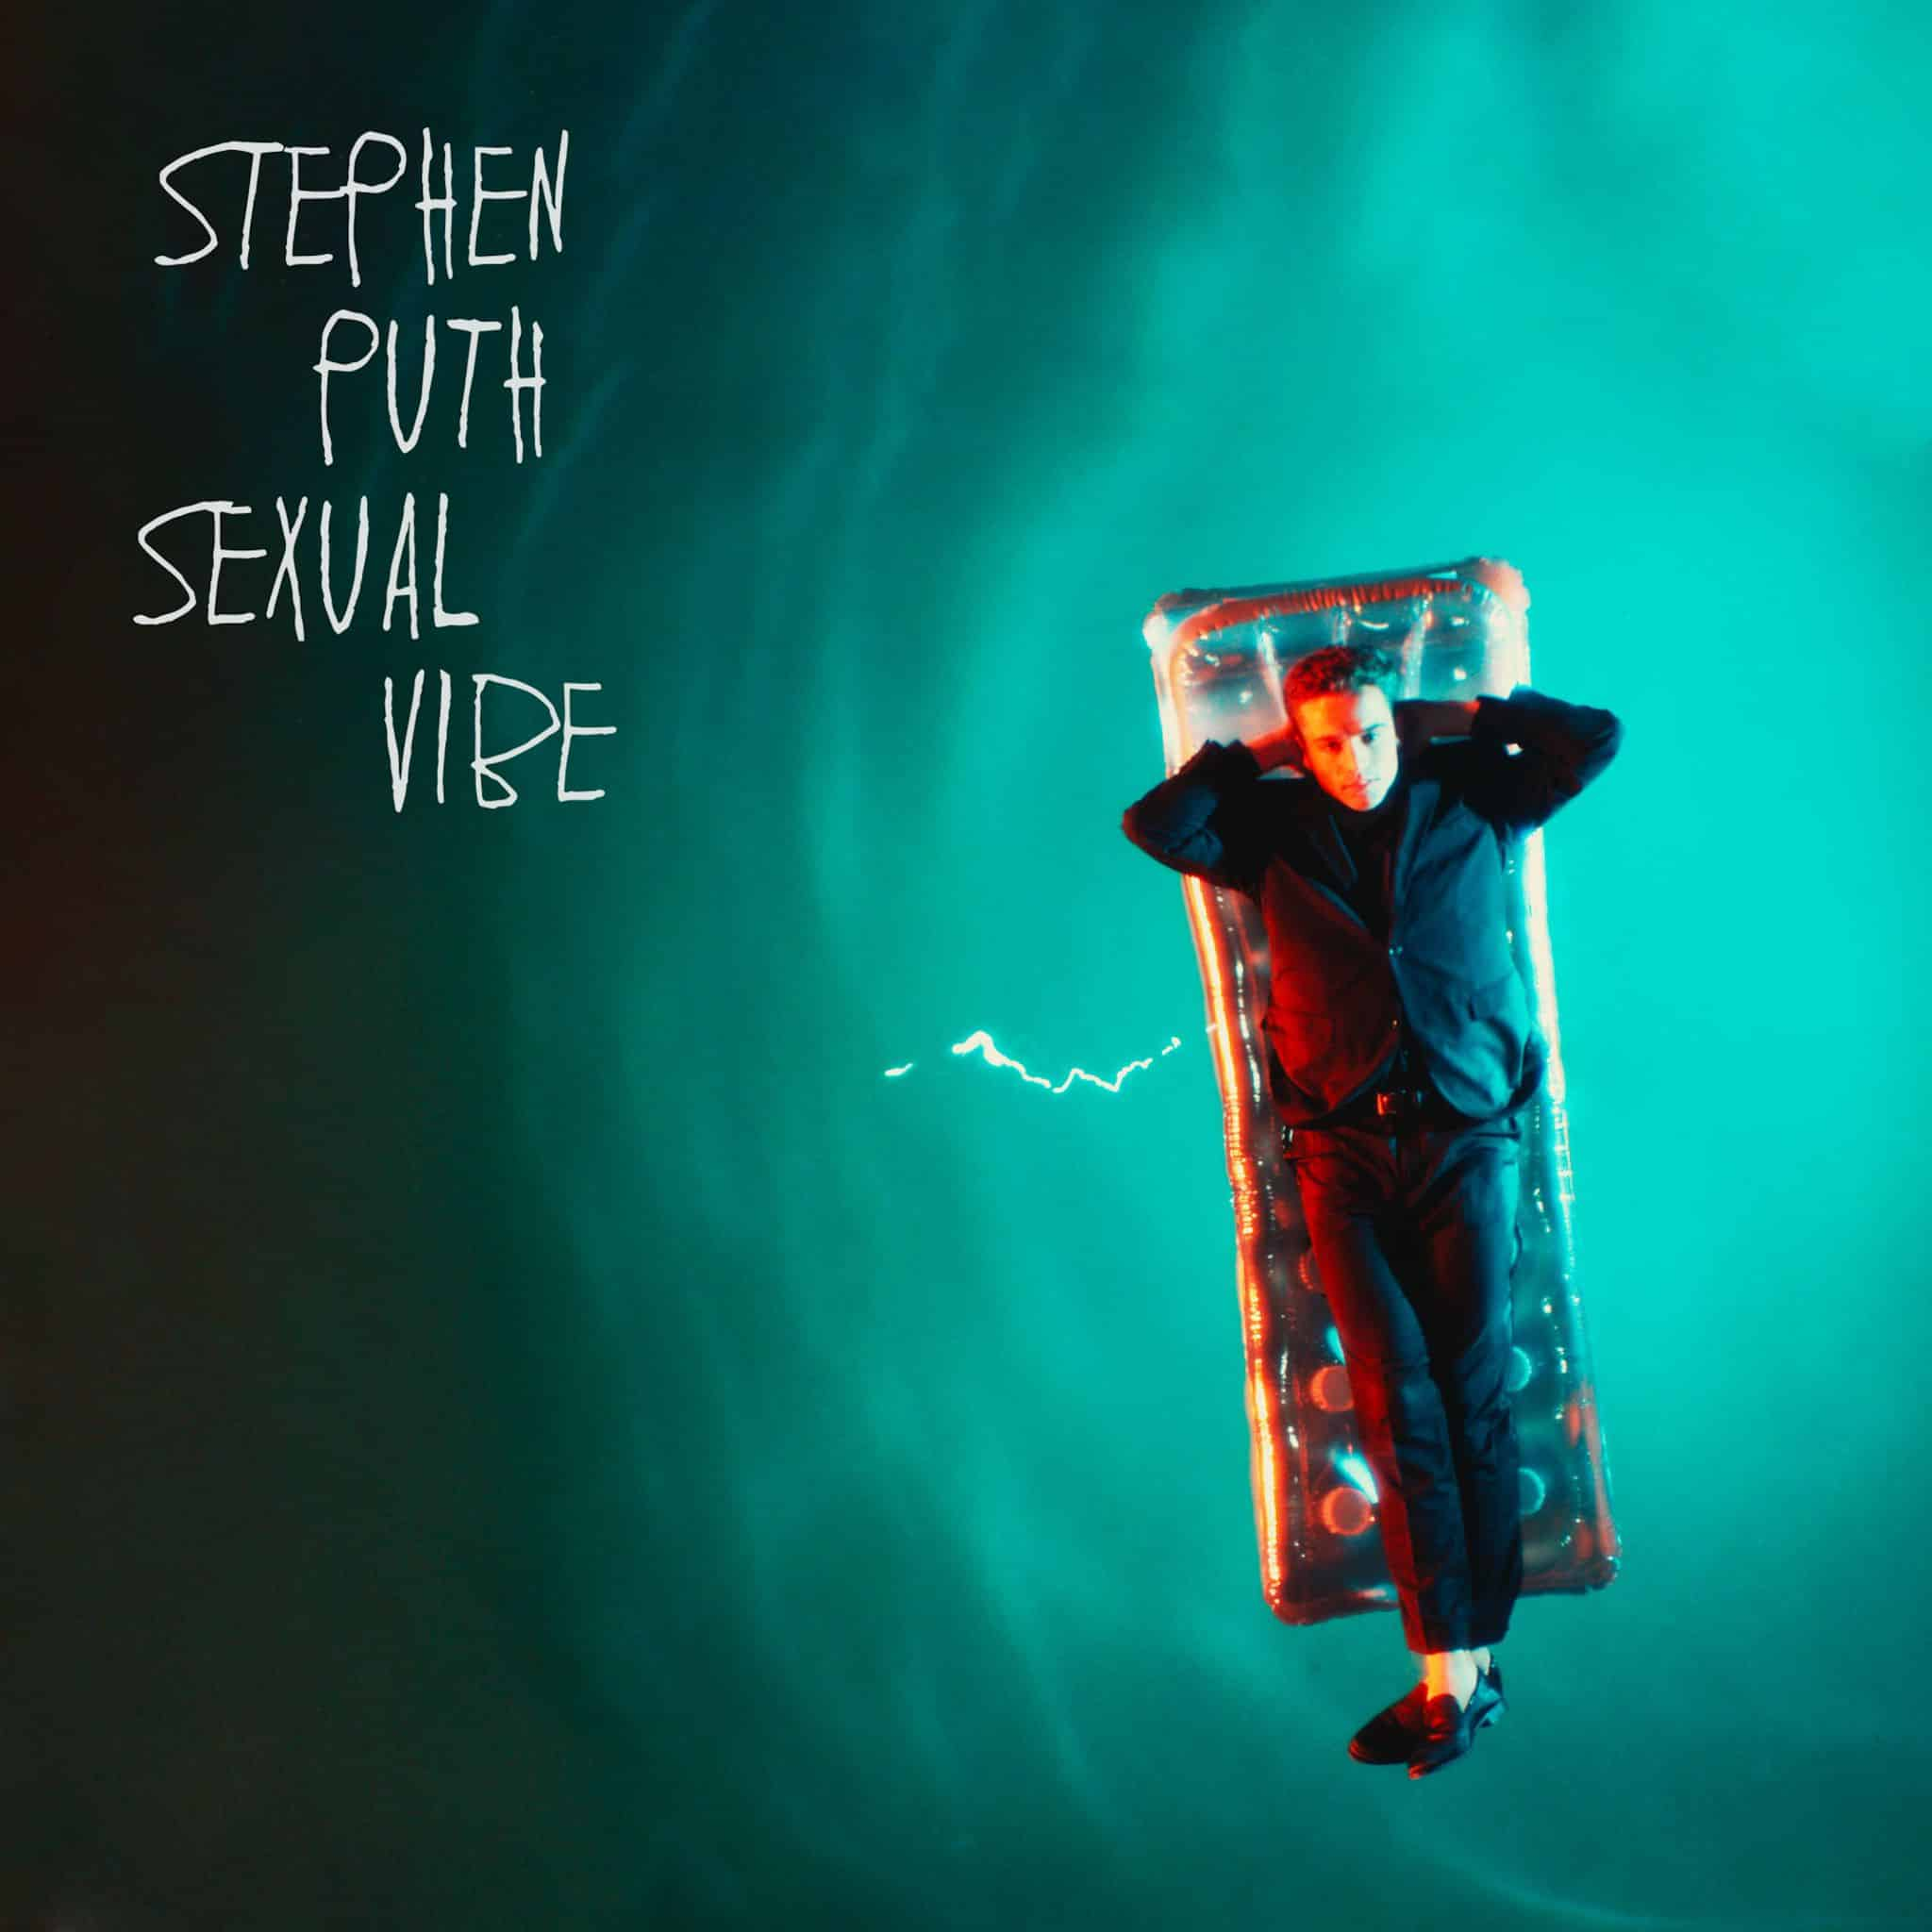 [Obrazek: Stephen-Puth_Sexual-Vibe_single-cover.jpeg]